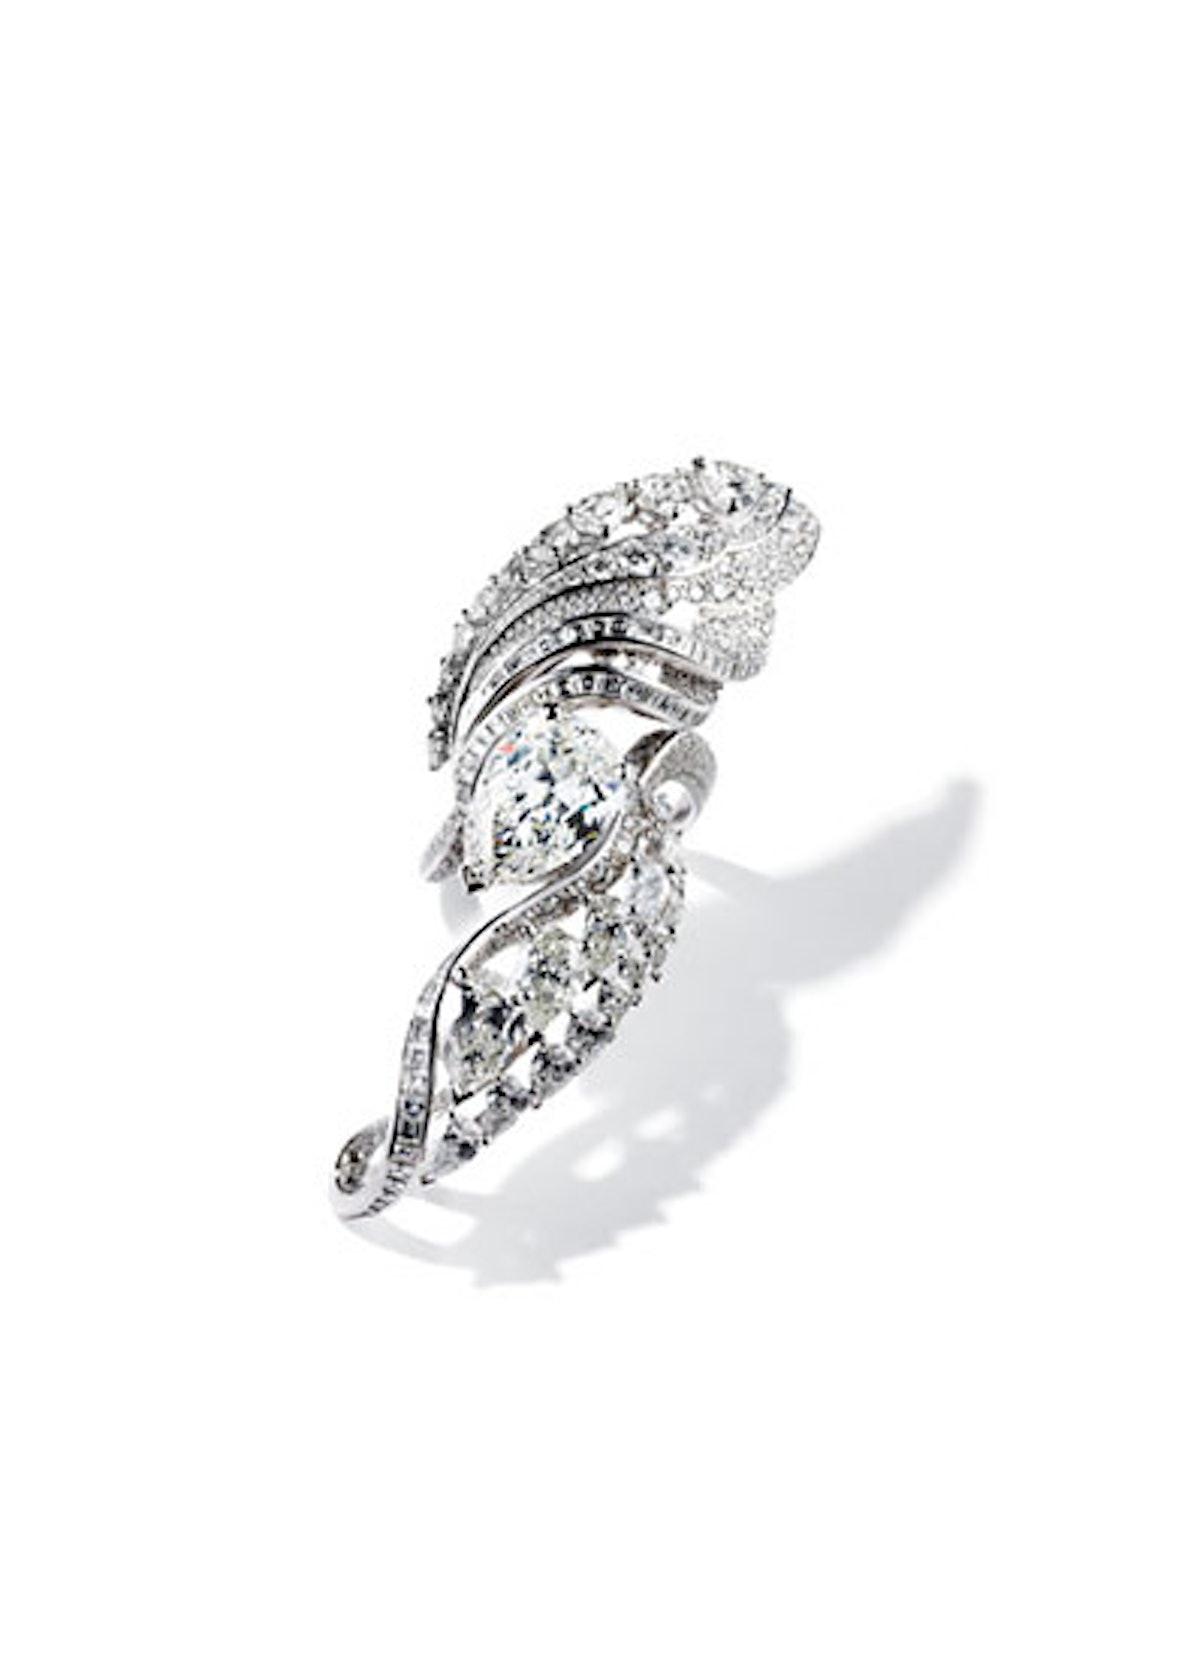 acss-claudia-mata-jewelry-picks-sept-2012-04-v.jpg